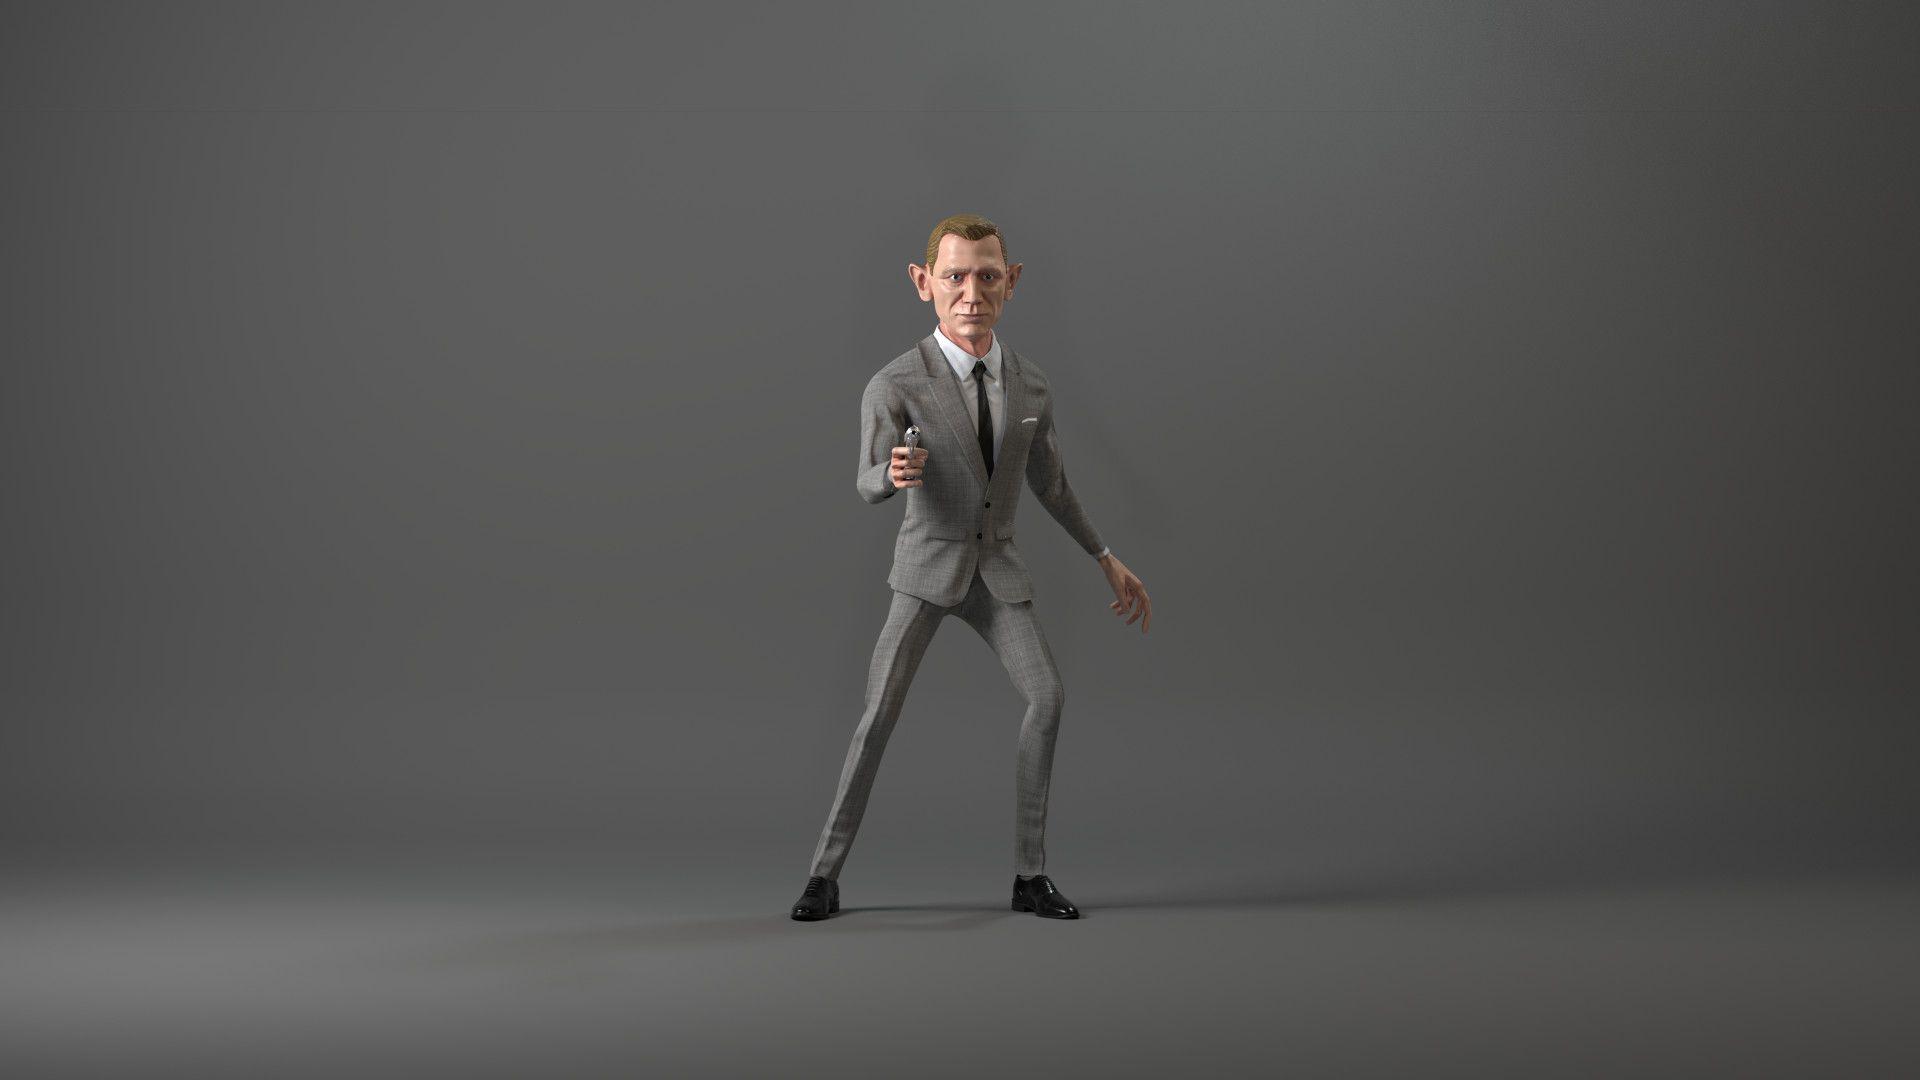 James Bond good wallpaper